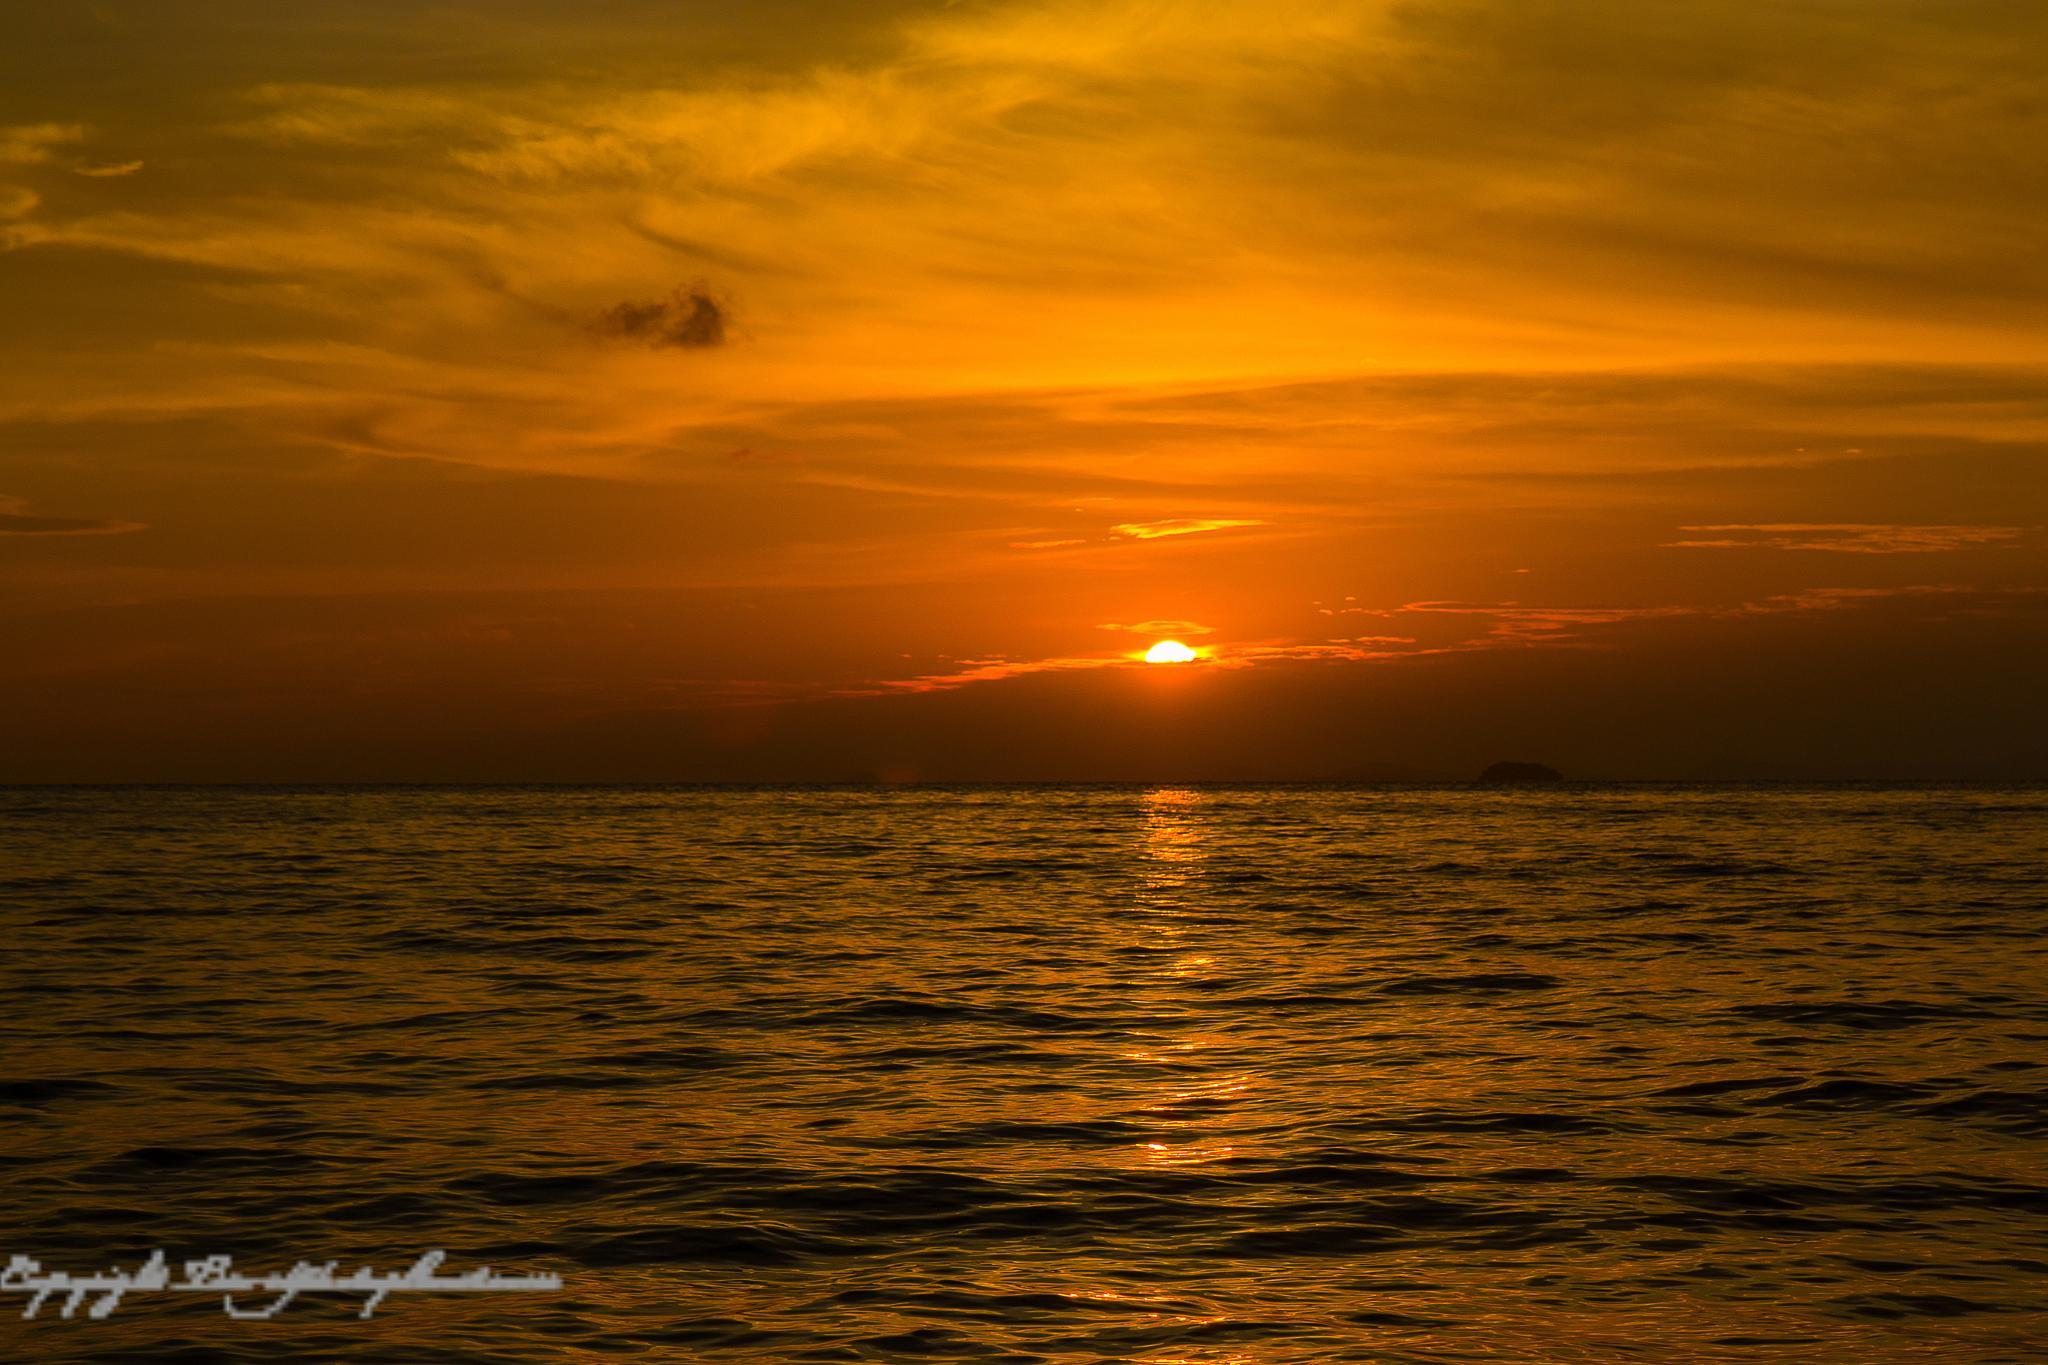 Phi Phi Island Sunset by Svein Arne Grønnevik